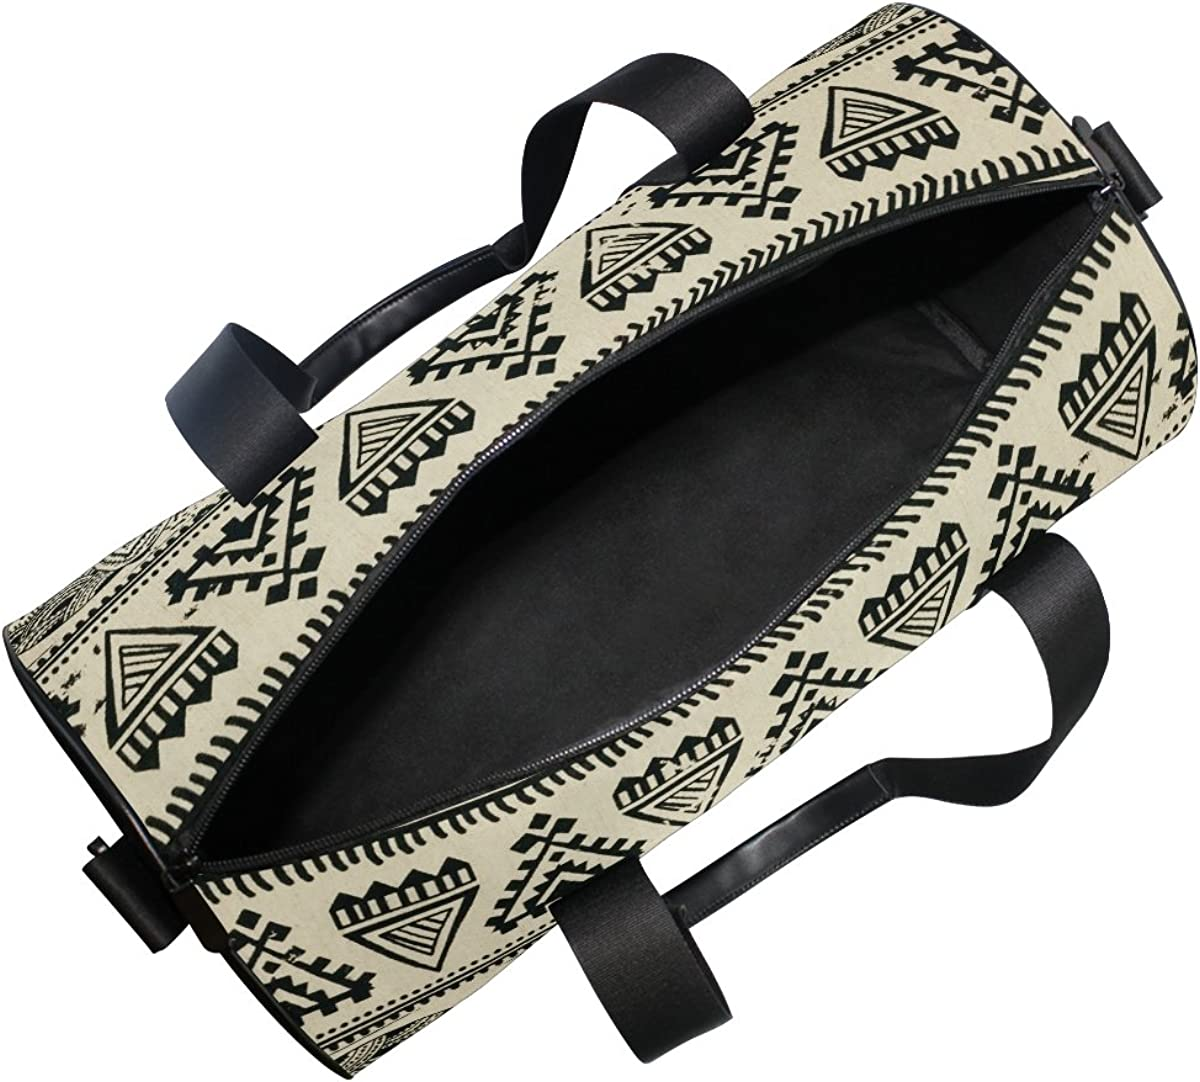 Evolutions Amazing Elephants Aztec Duffels Bag Sports Gym Bags for Men /& Women